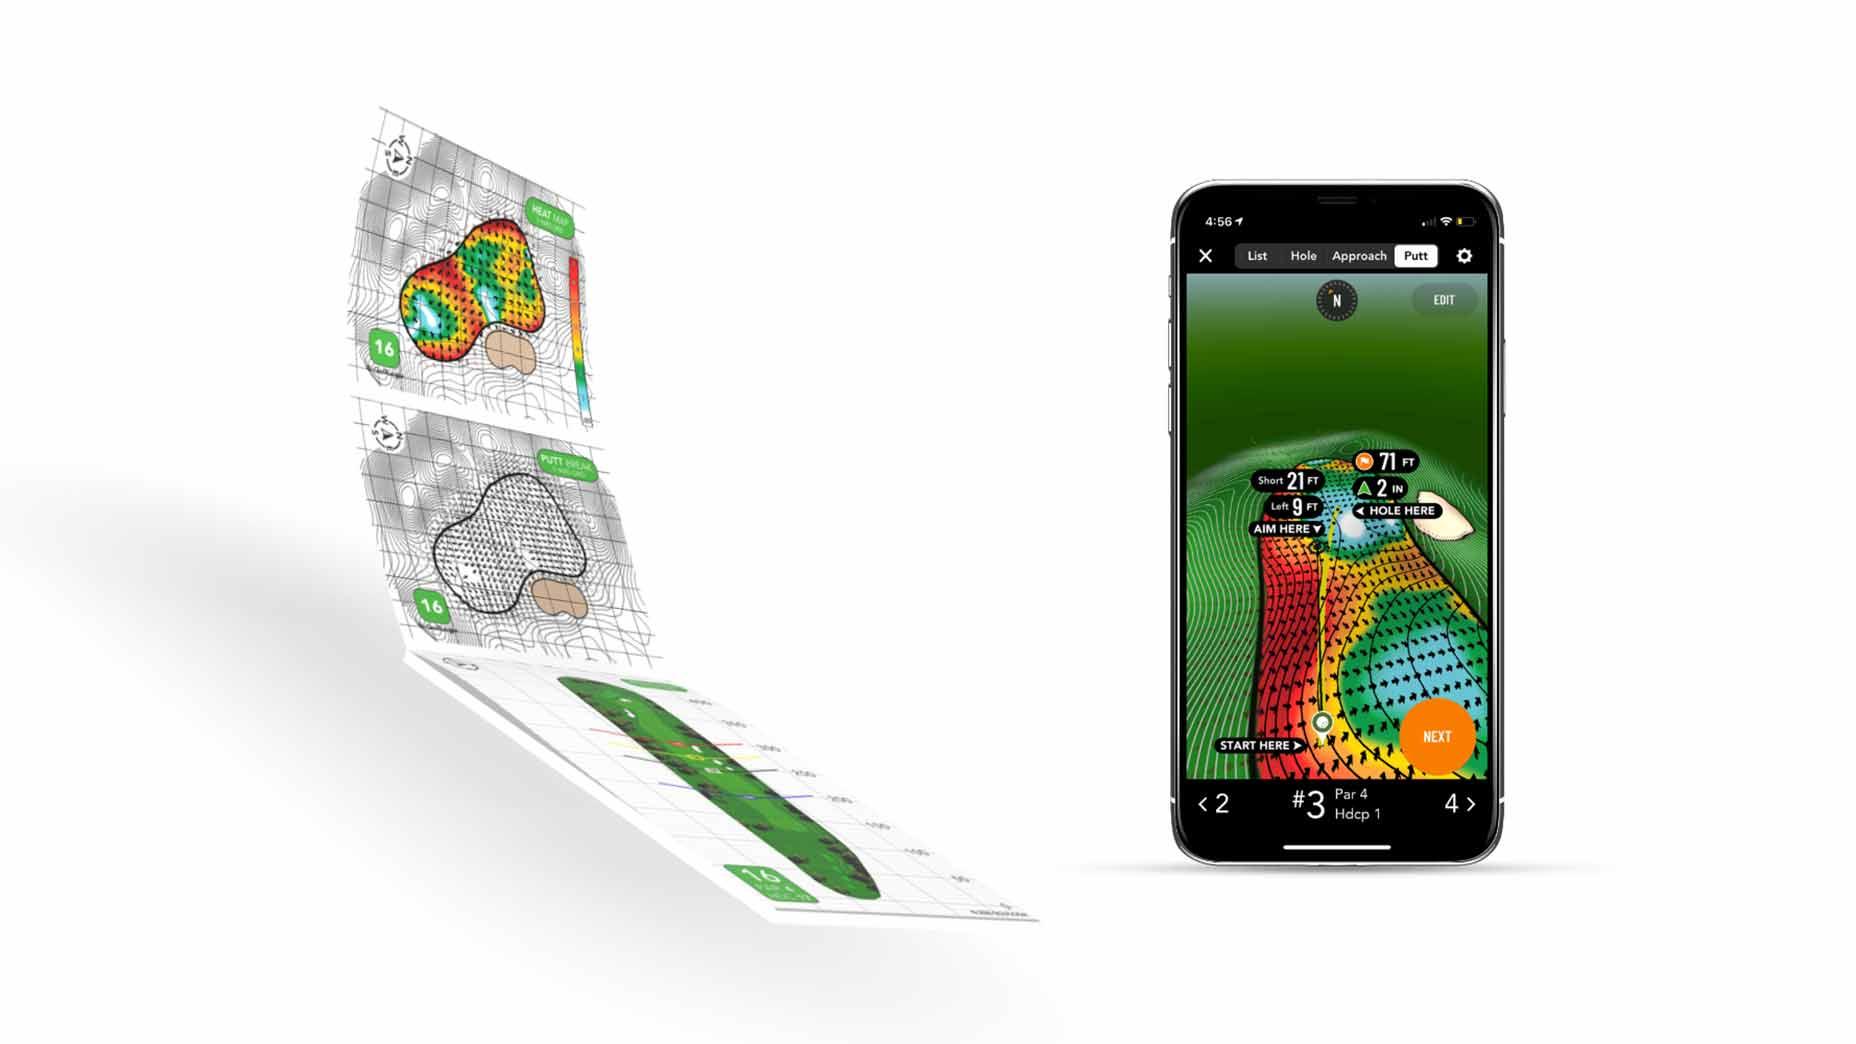 GolfLogix green reading app